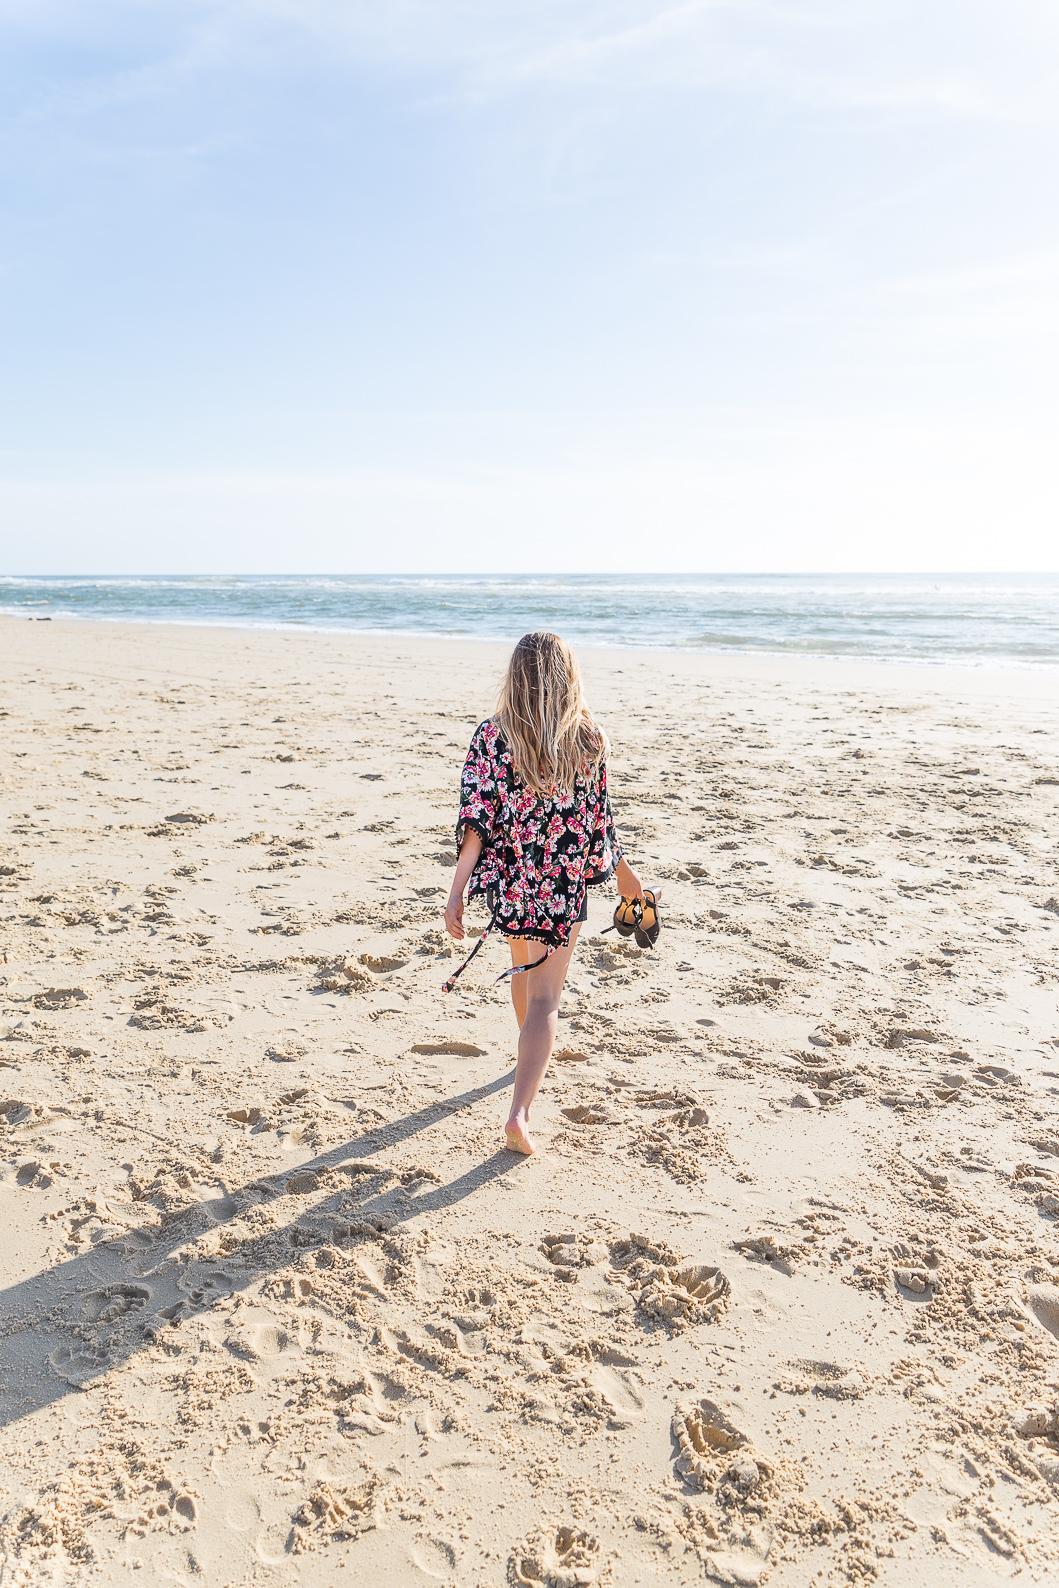 Biscarosse océan plage